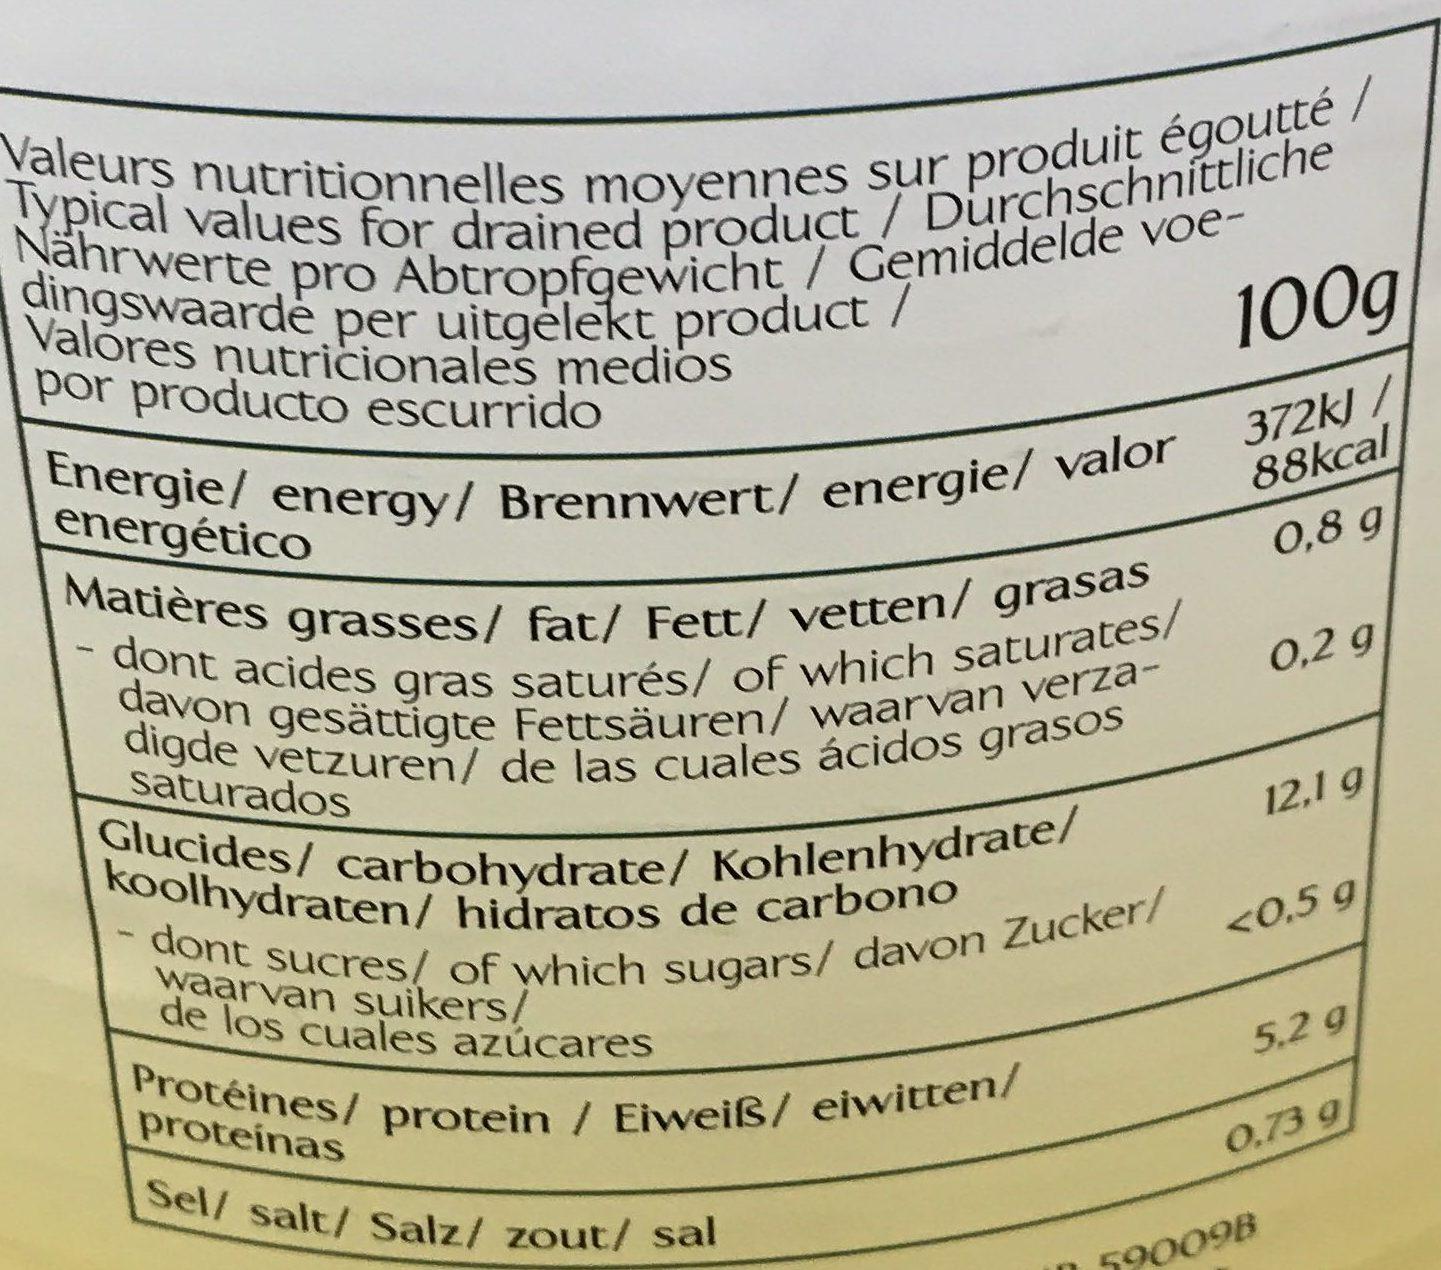 Flageolets verts extra fins - Voedingswaarden - fr